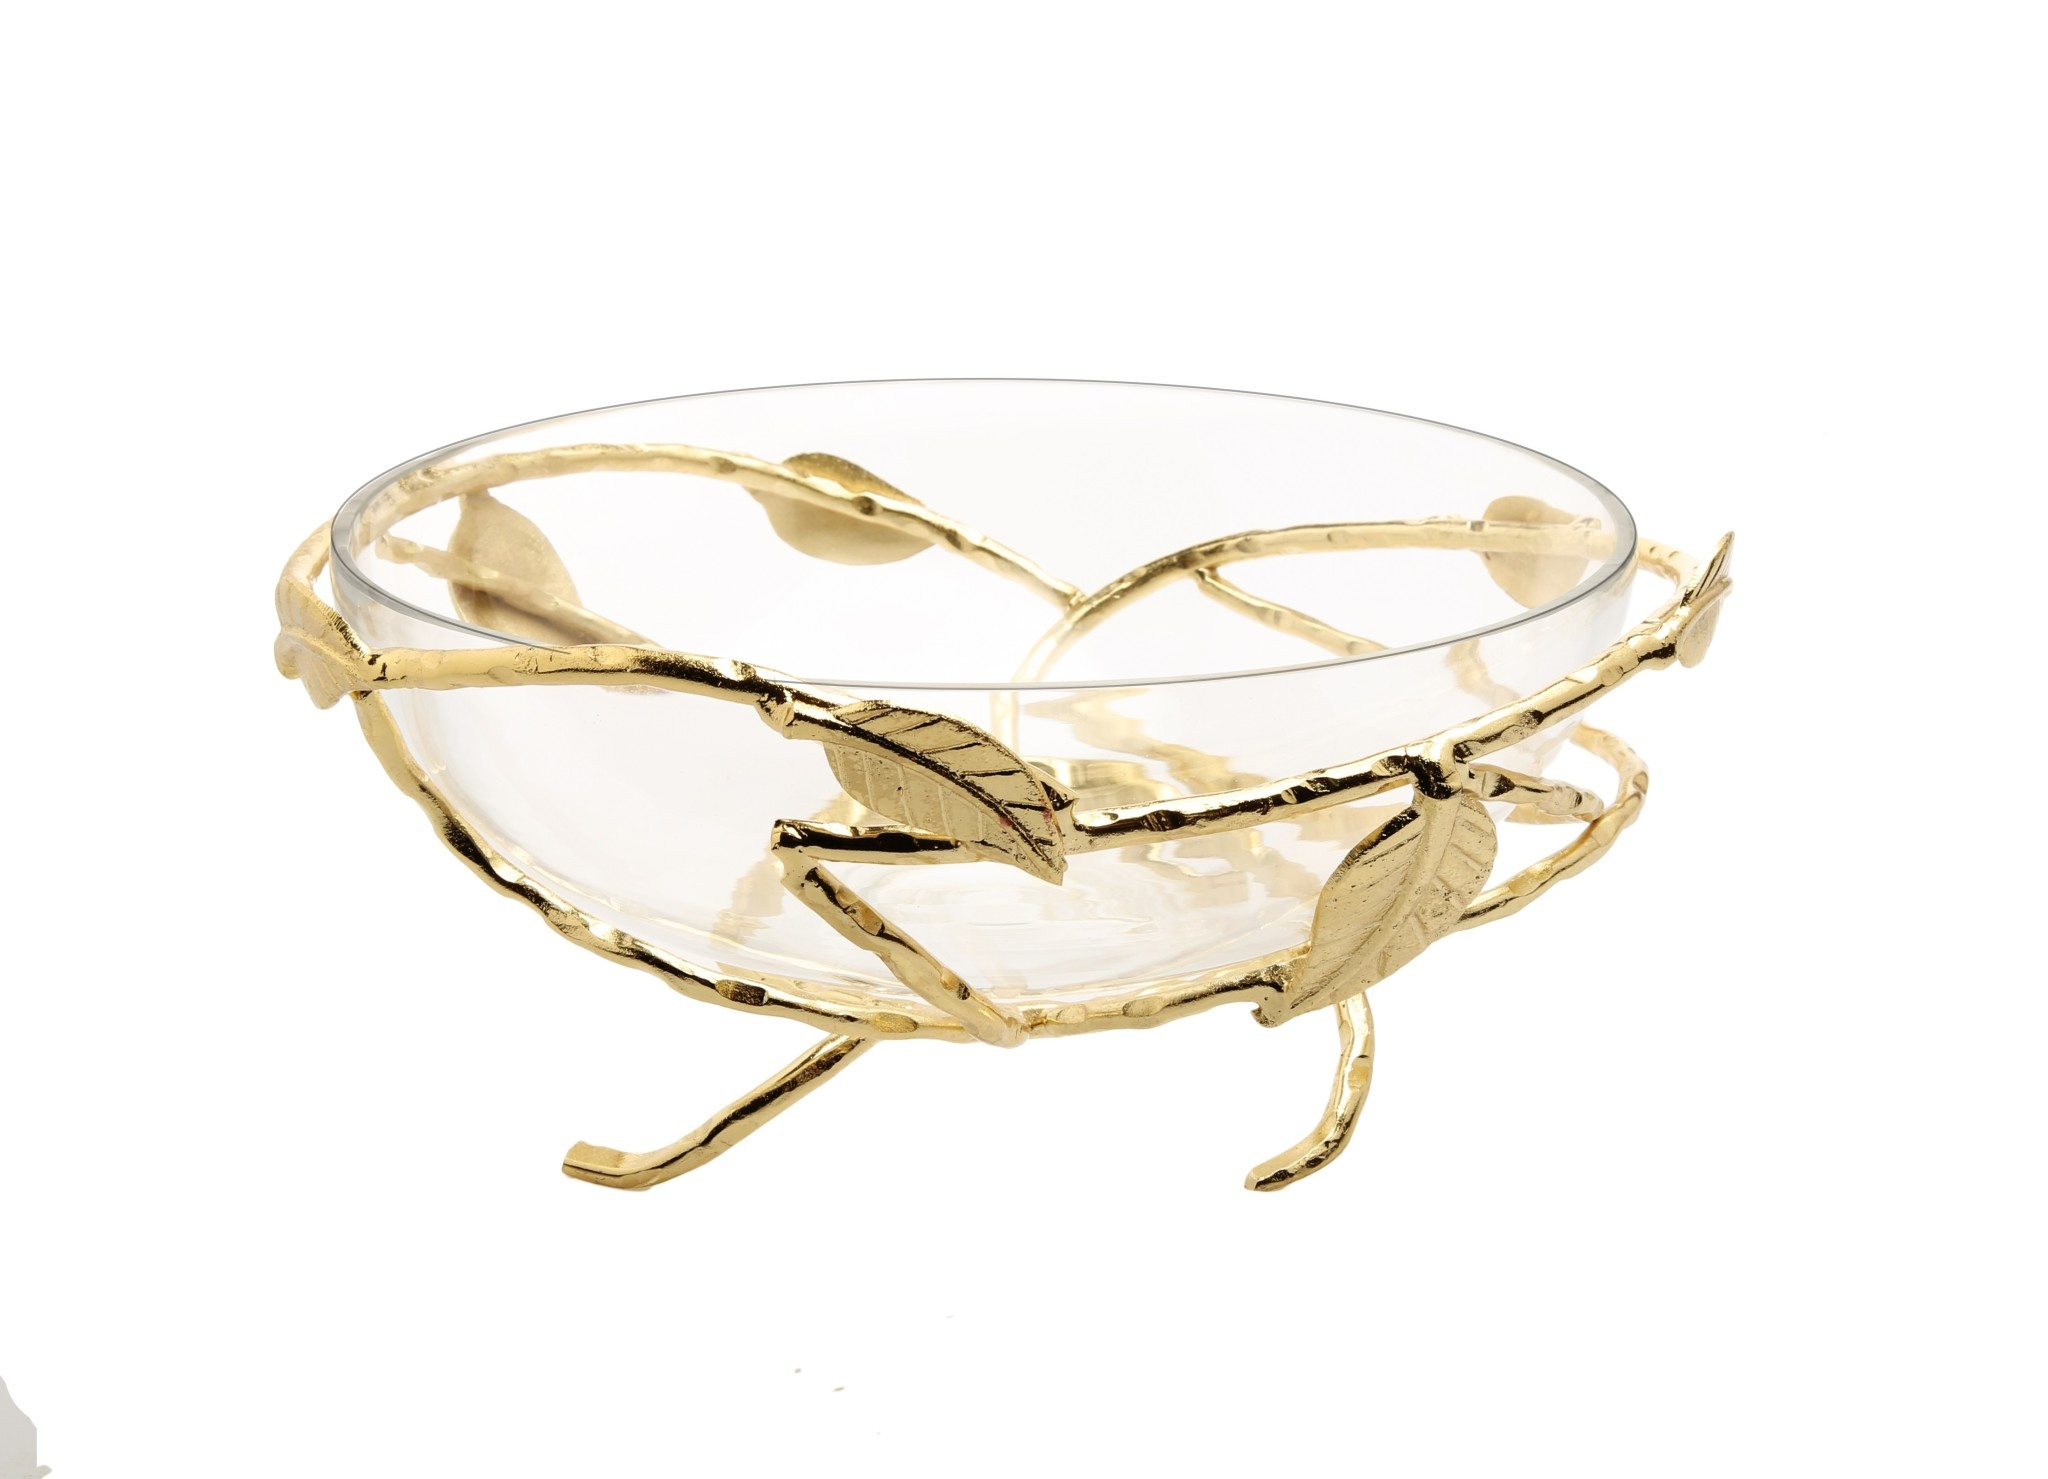 Hammered Glass Salad Bowl with Gold Brass Leaf Decoration